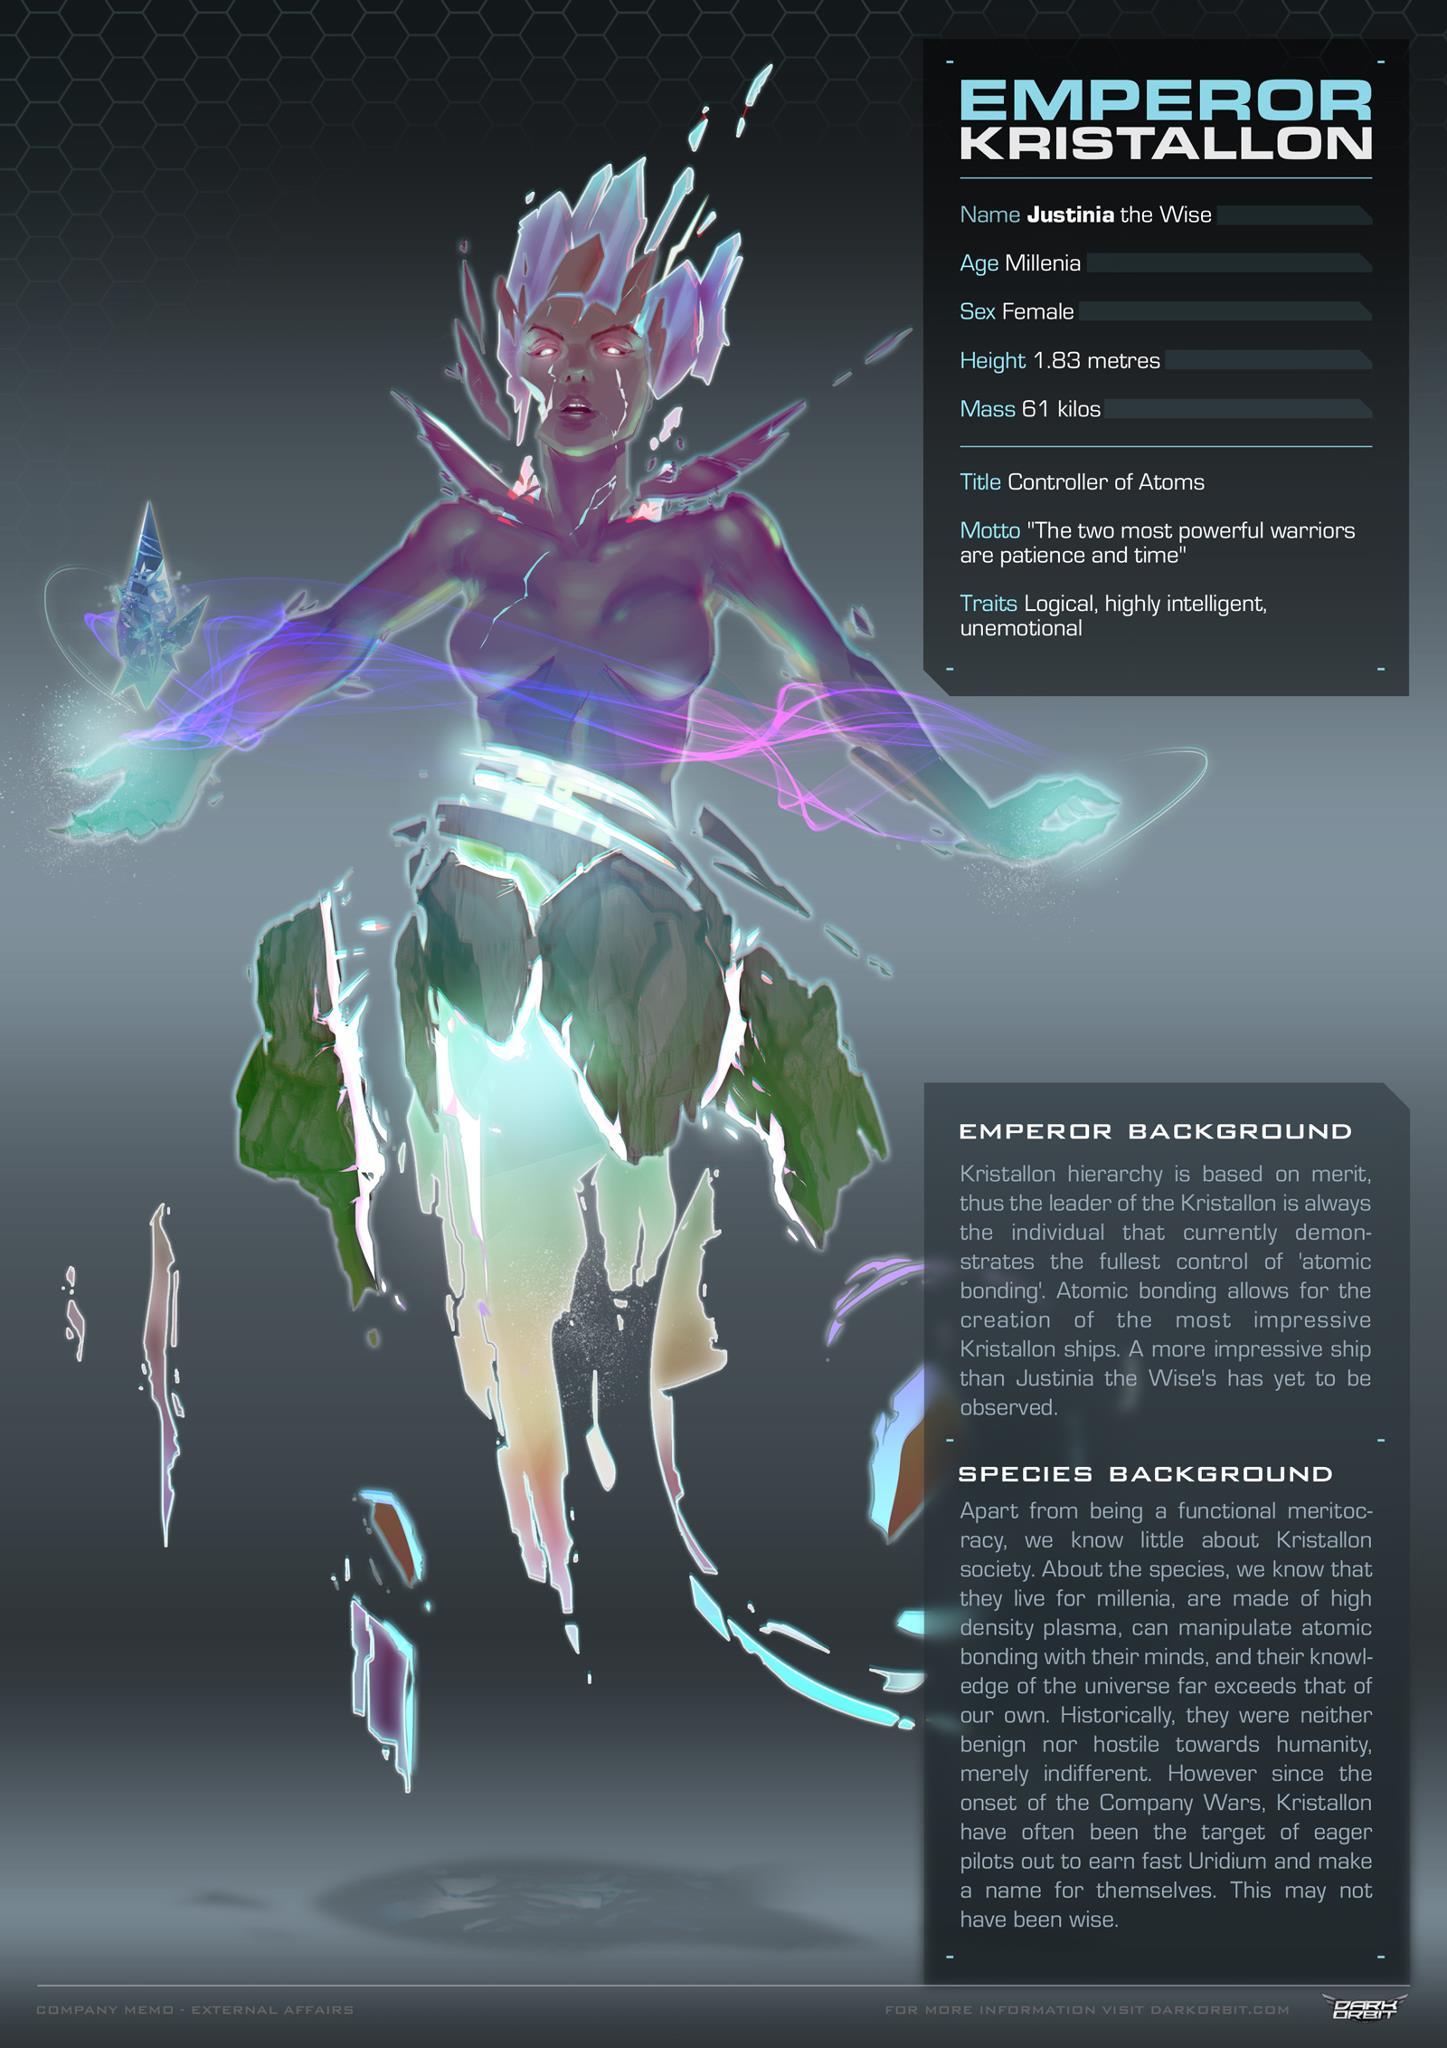 Emperor Kristallon | DarkOrbit | FANDOM powered by Wikia